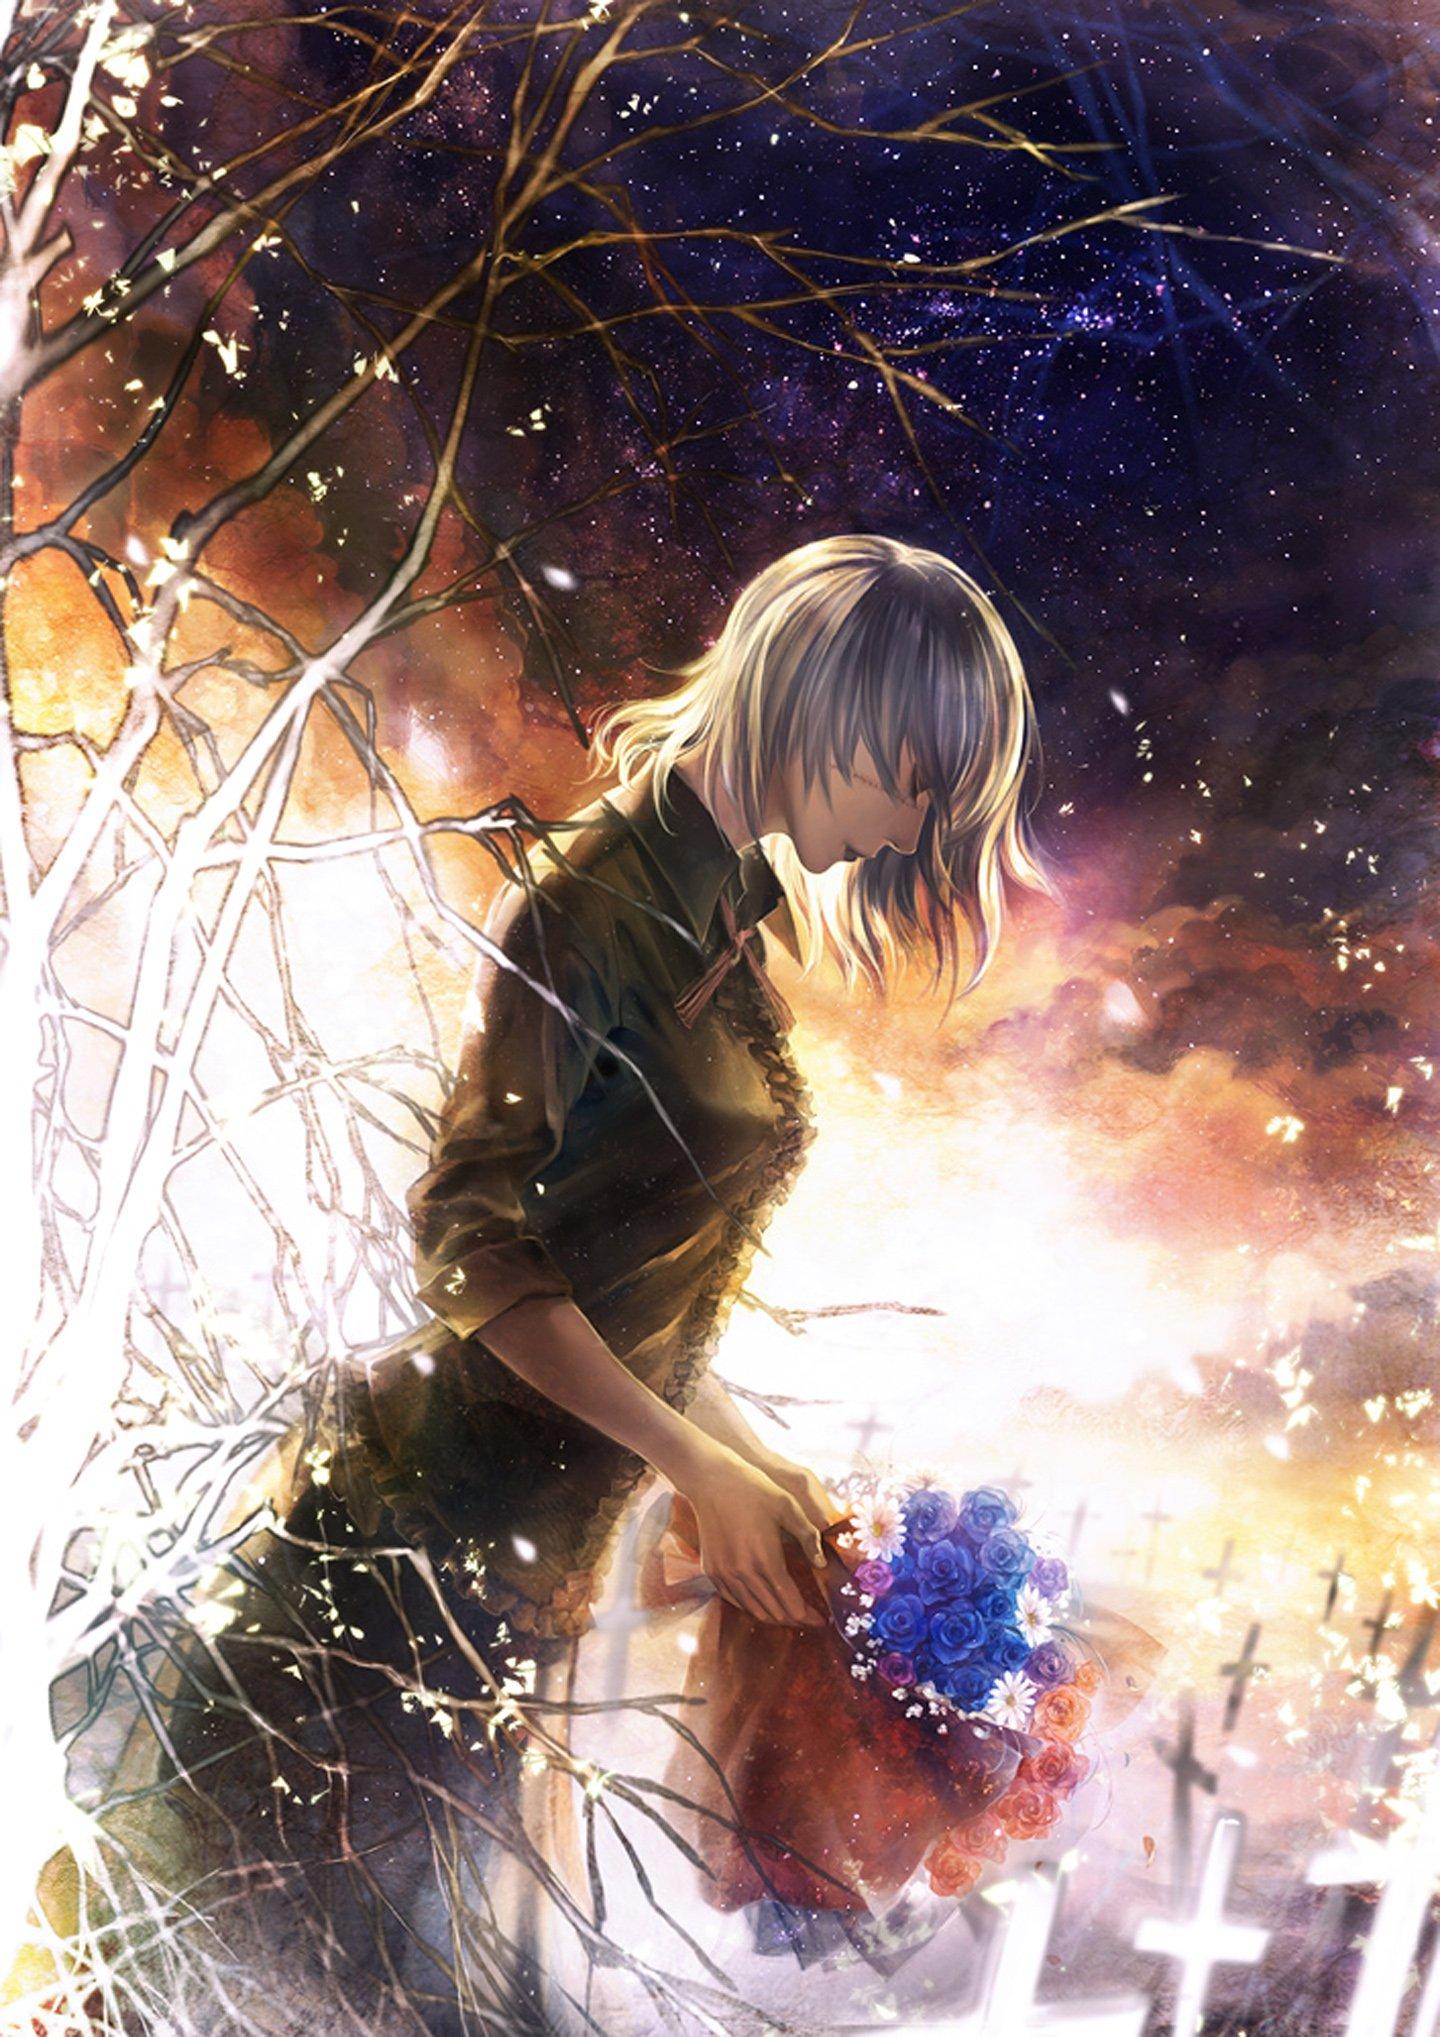 Original Girl Flower Rose Blue Sad Anime Short Hair Wallpaper 1440x2037 634351 Wallpaperup